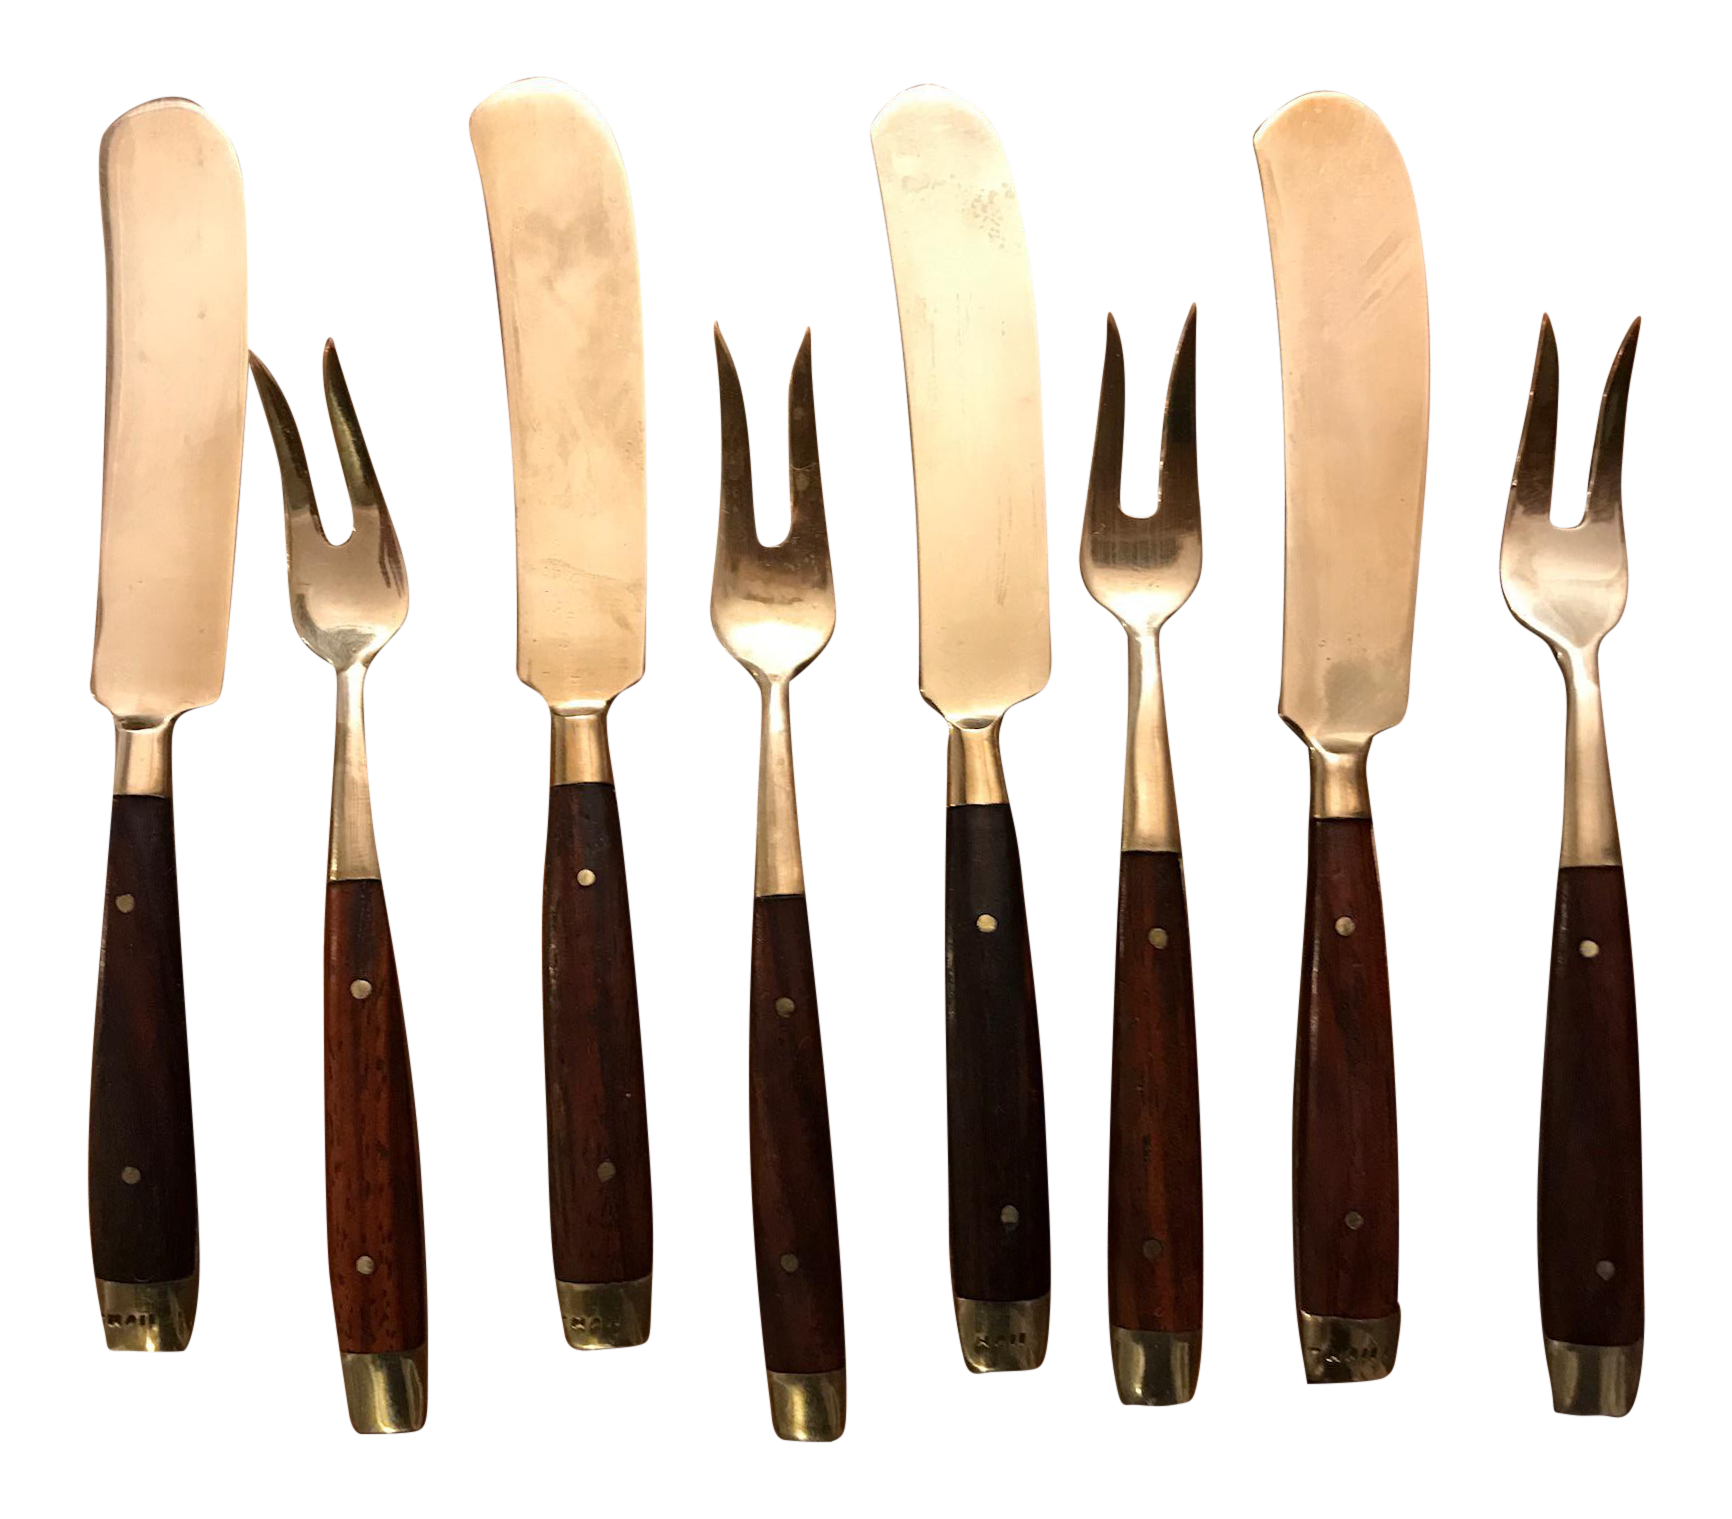 Vintage Thai Appetizer Utensils Set Of 4 Chairish